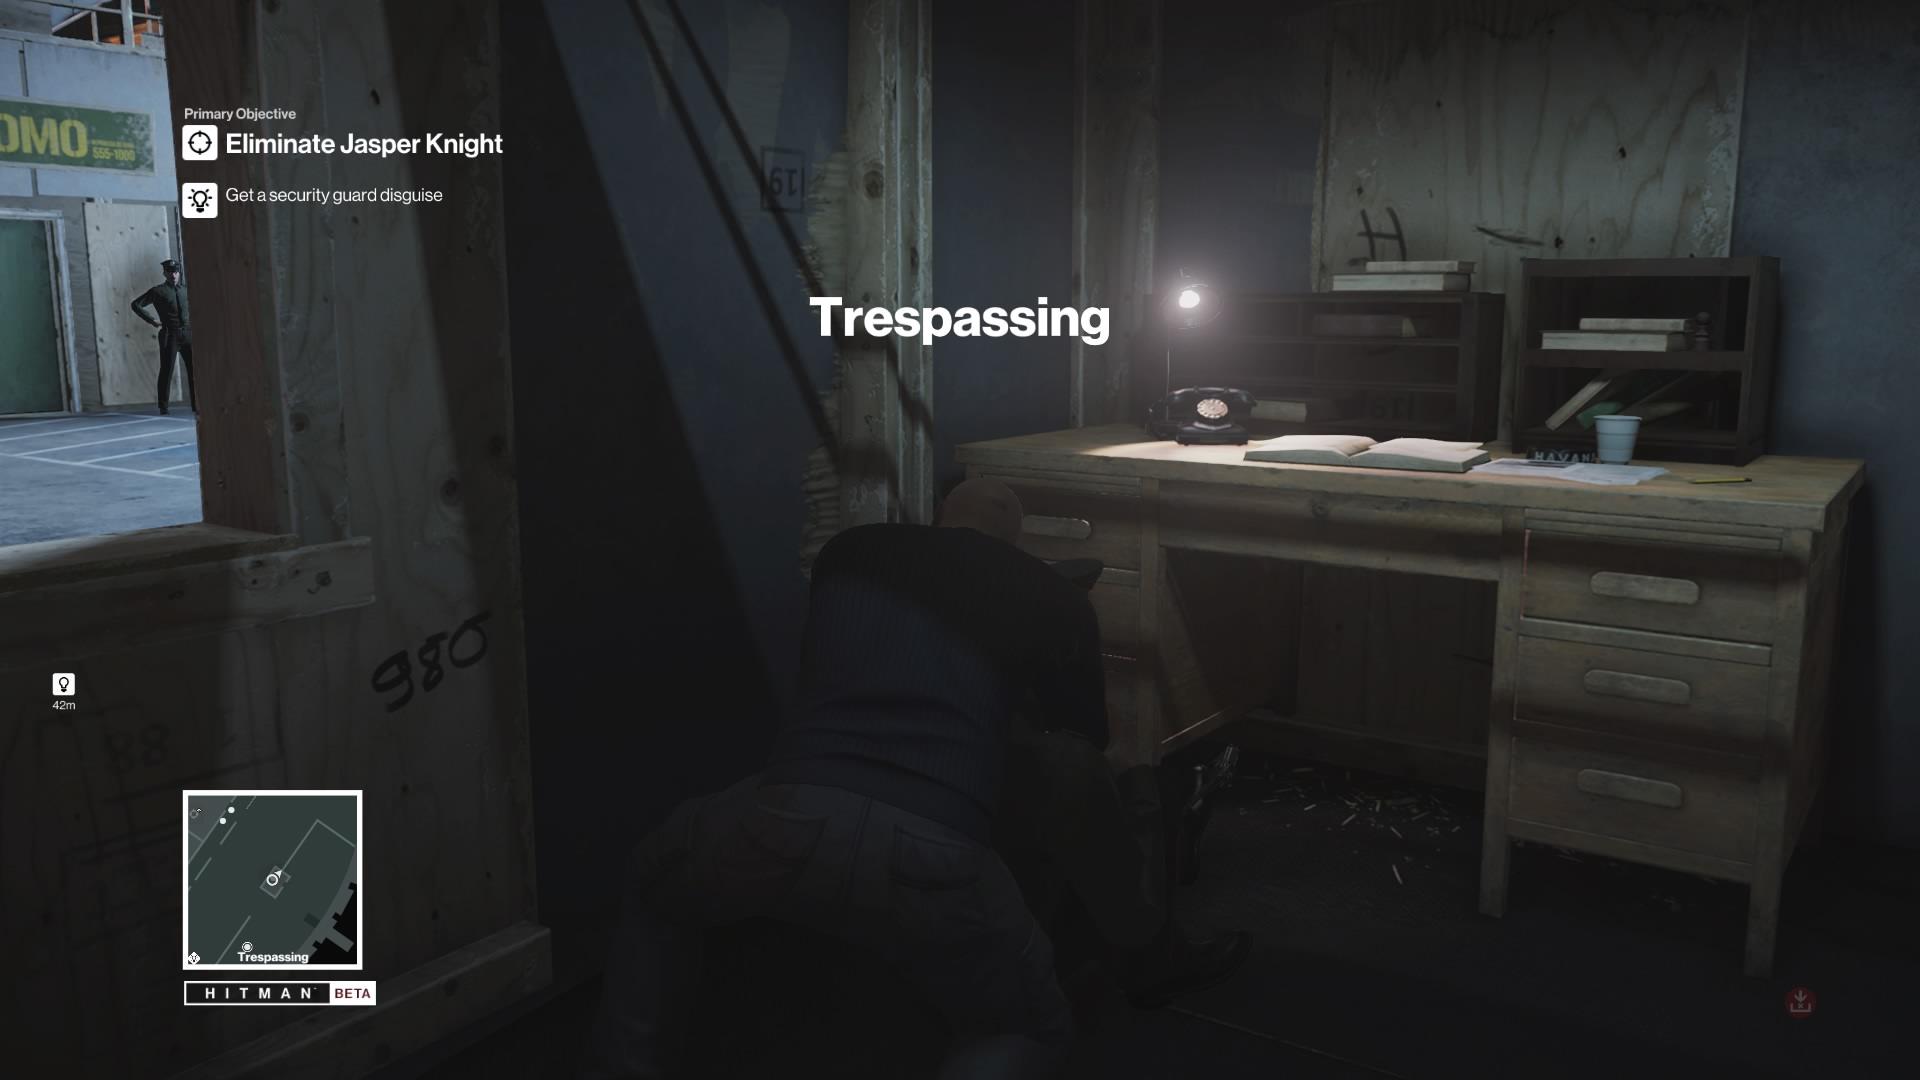 How to Eliminate Jasper Knight